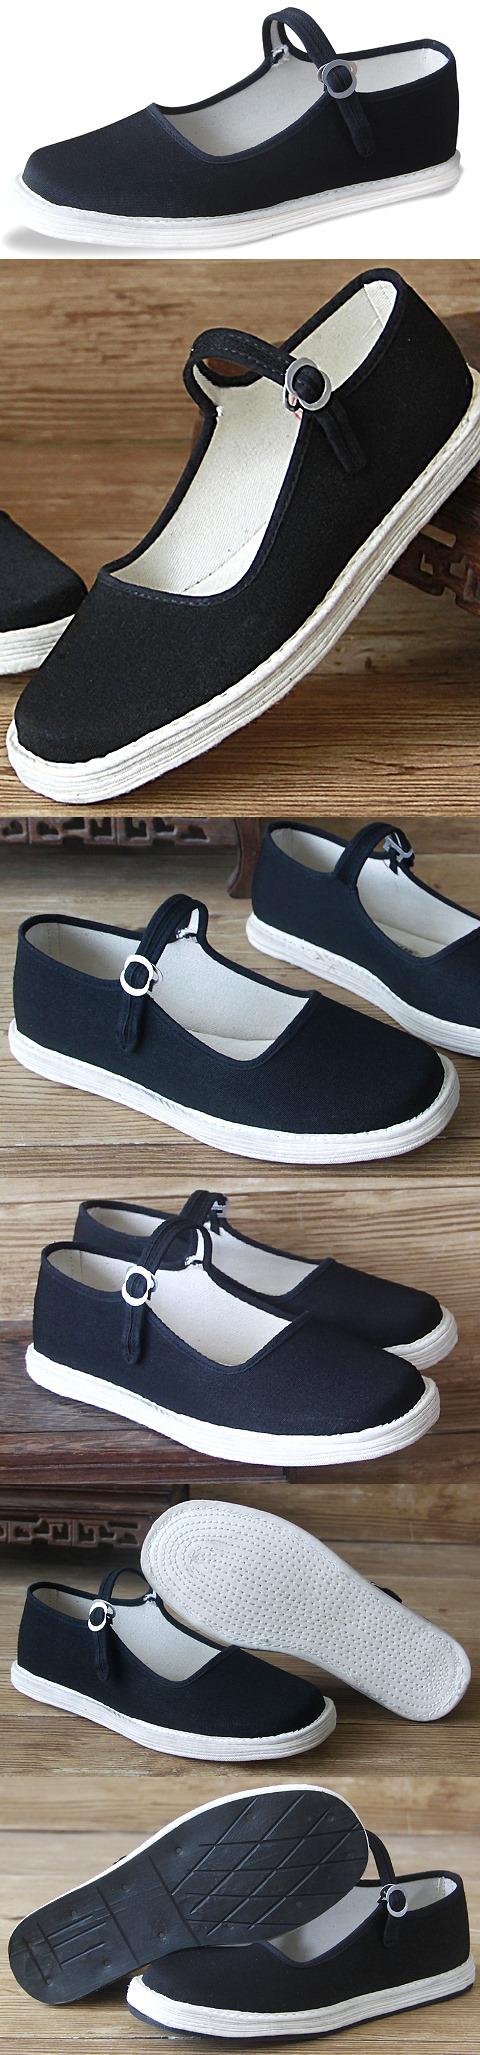 Handmade Qiancengdi Cloth Shoes w/ Strap